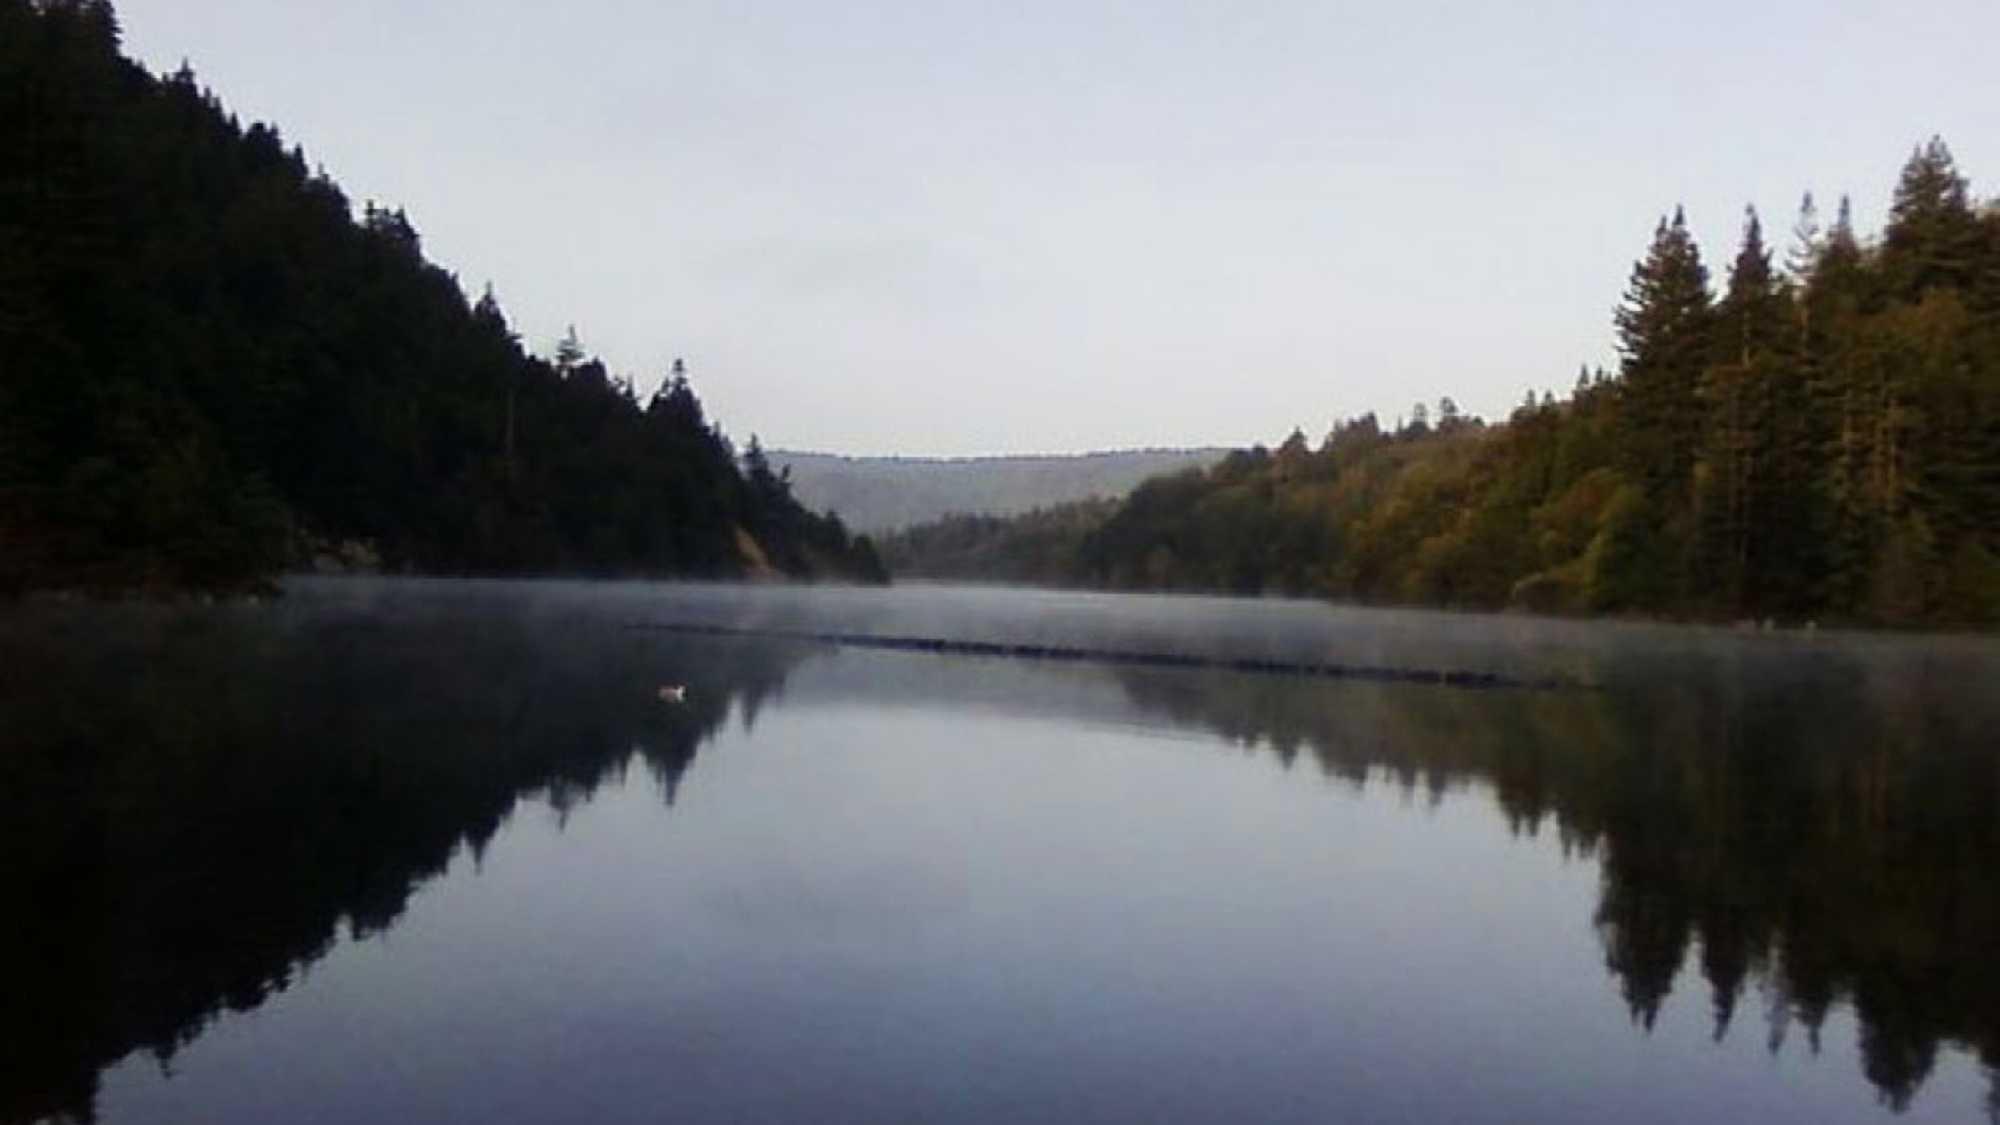 Loch Lomond Reservoir / File photo